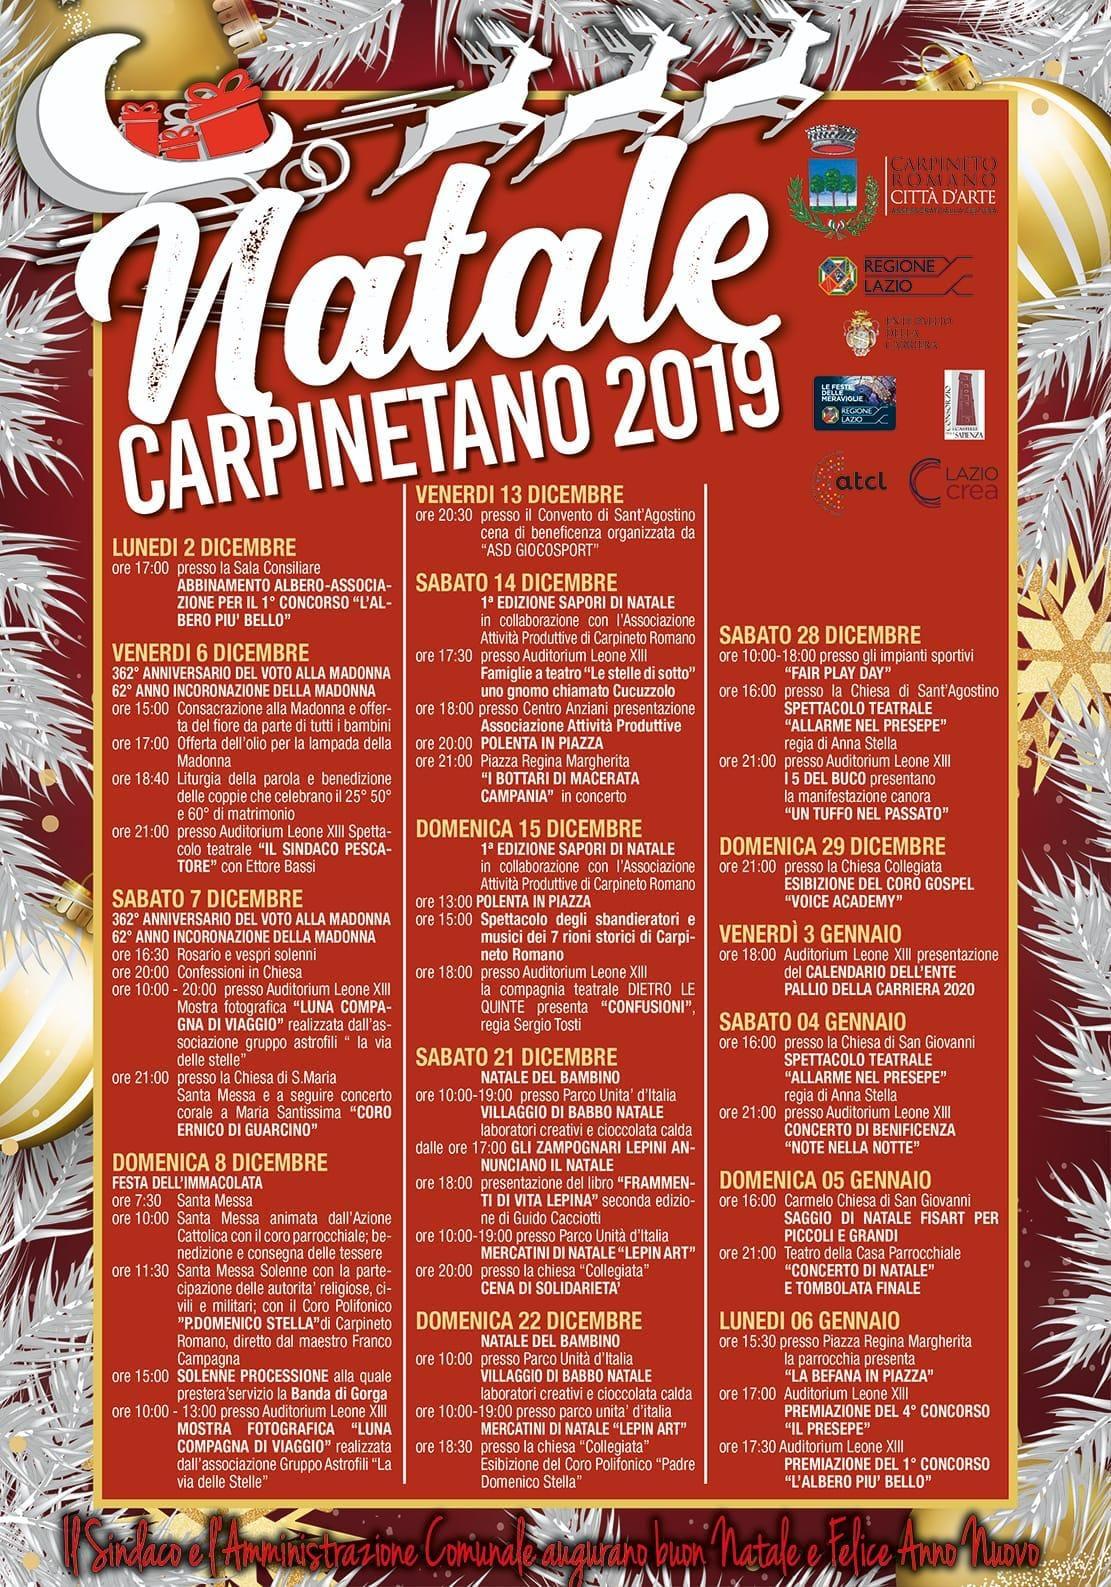 natale-carpinetano